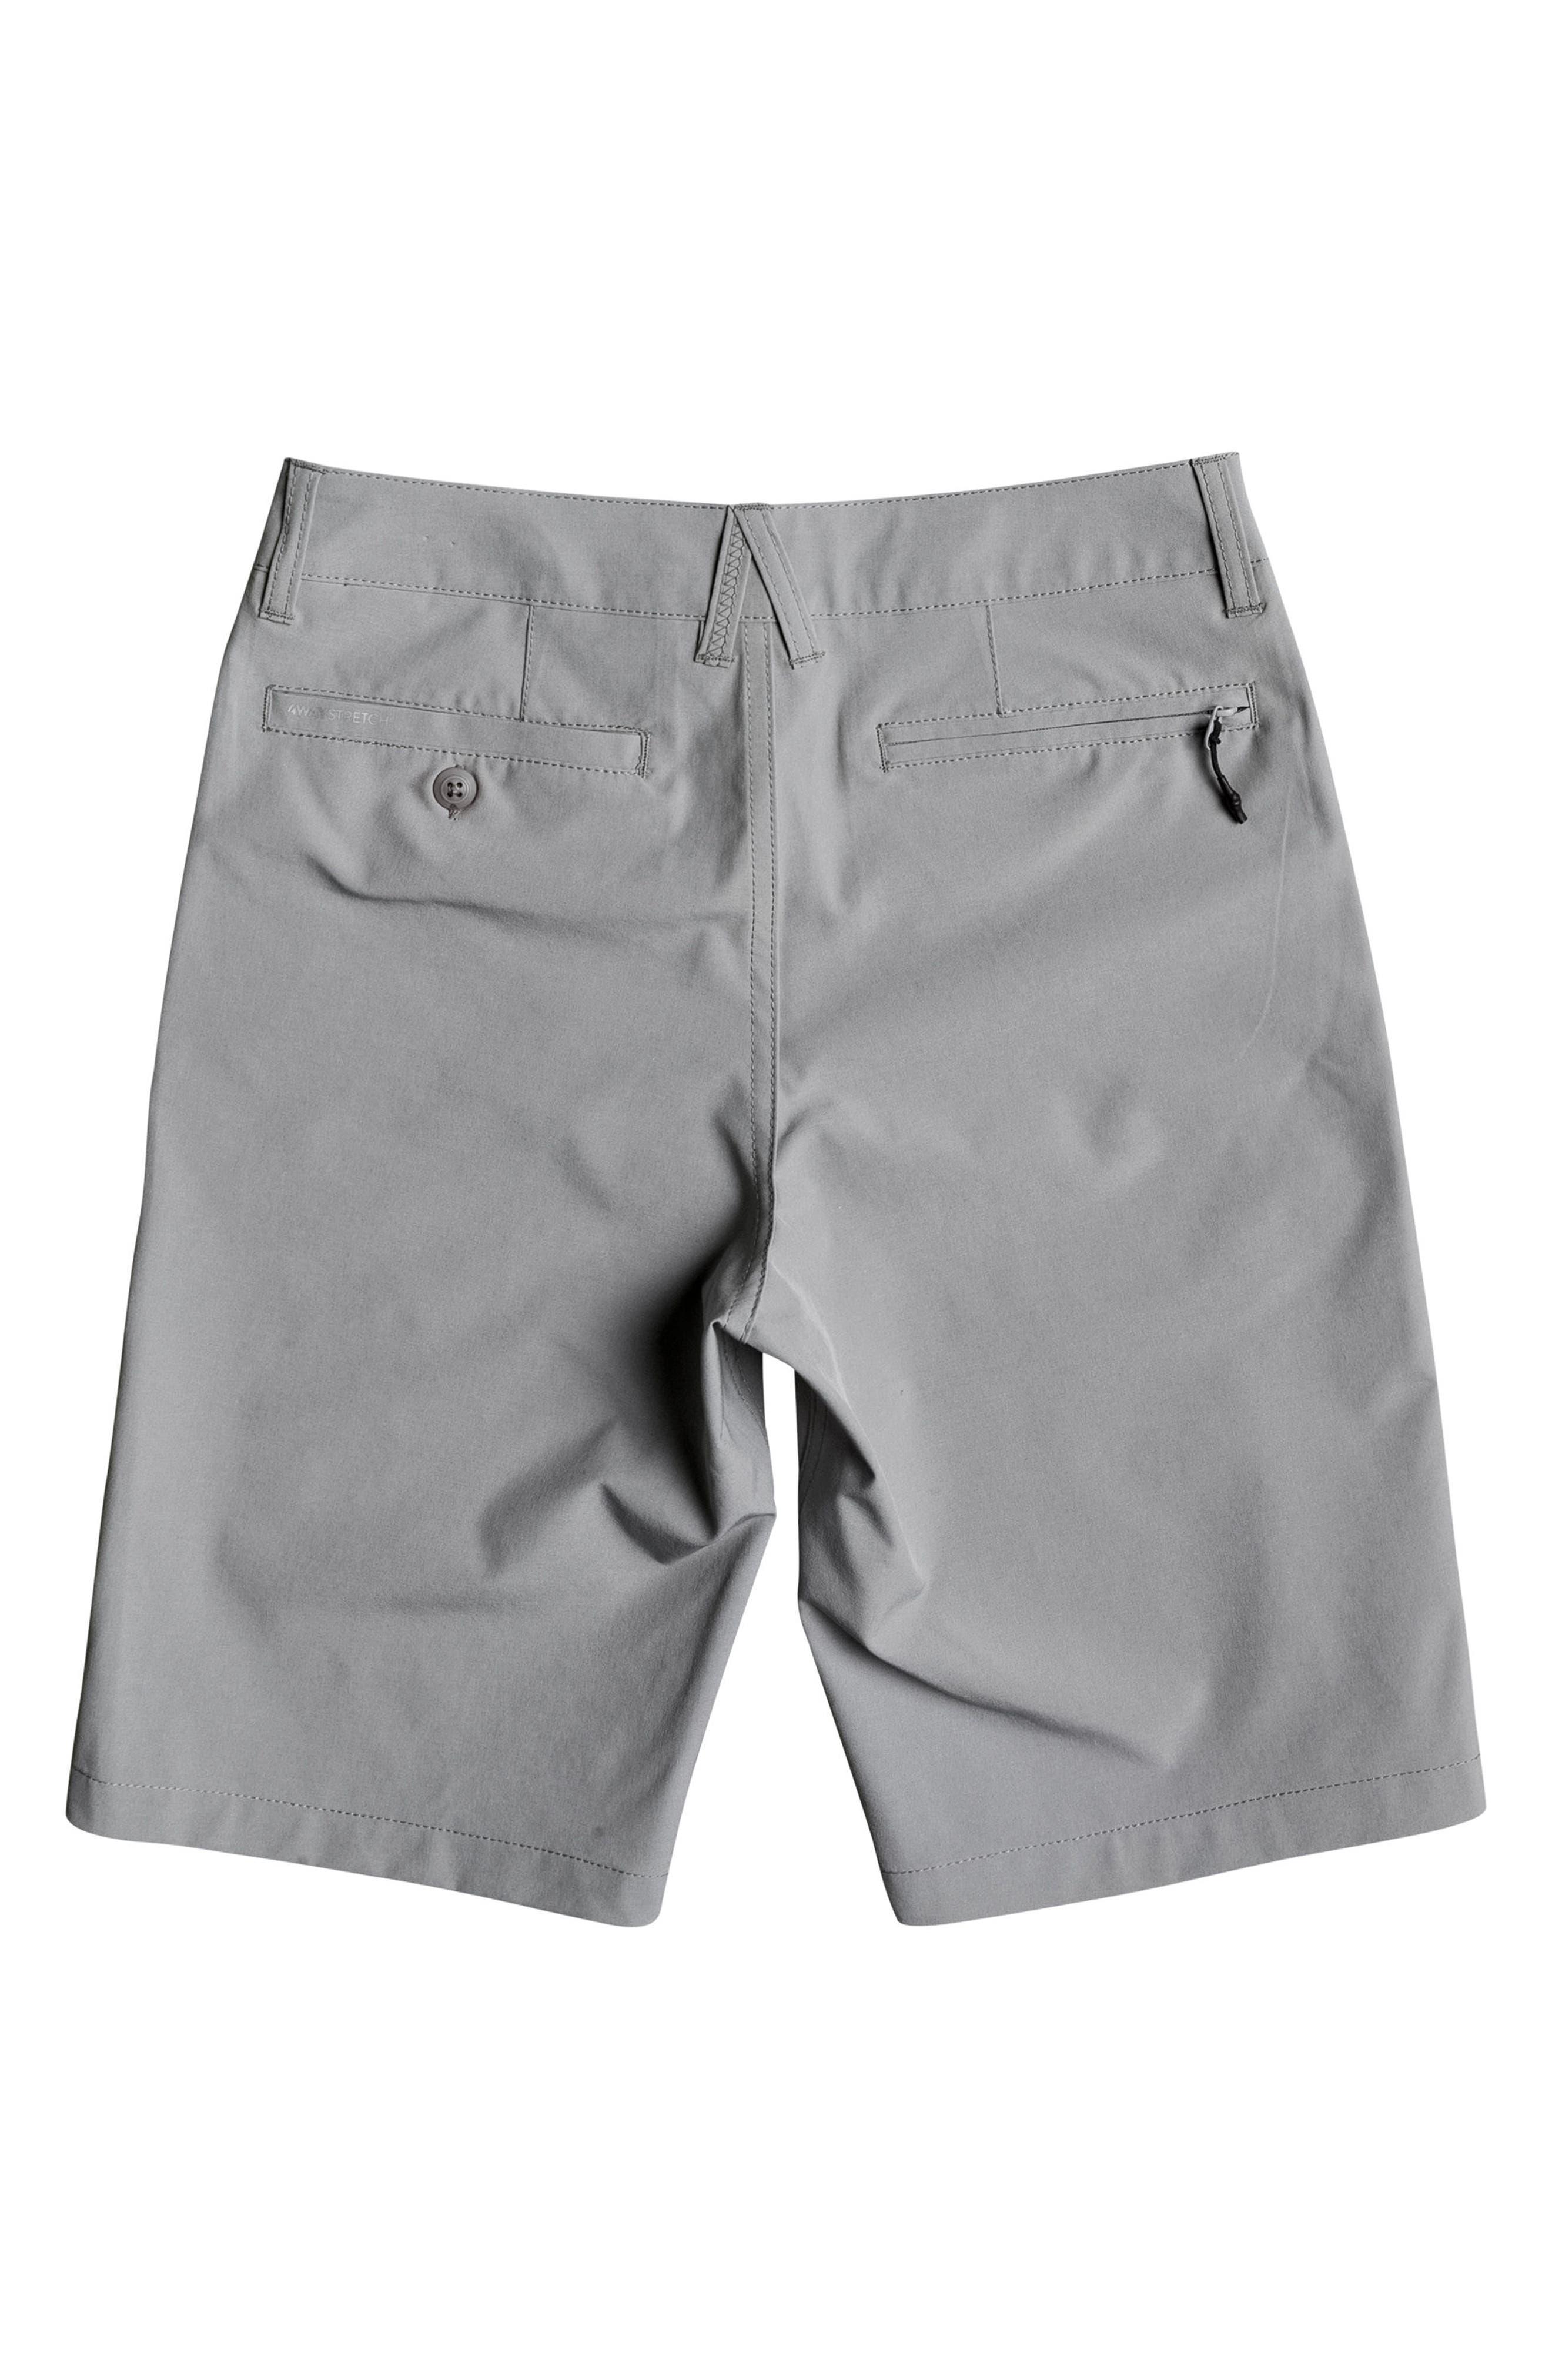 Union Amphibian Board Shorts,                             Alternate thumbnail 6, color,